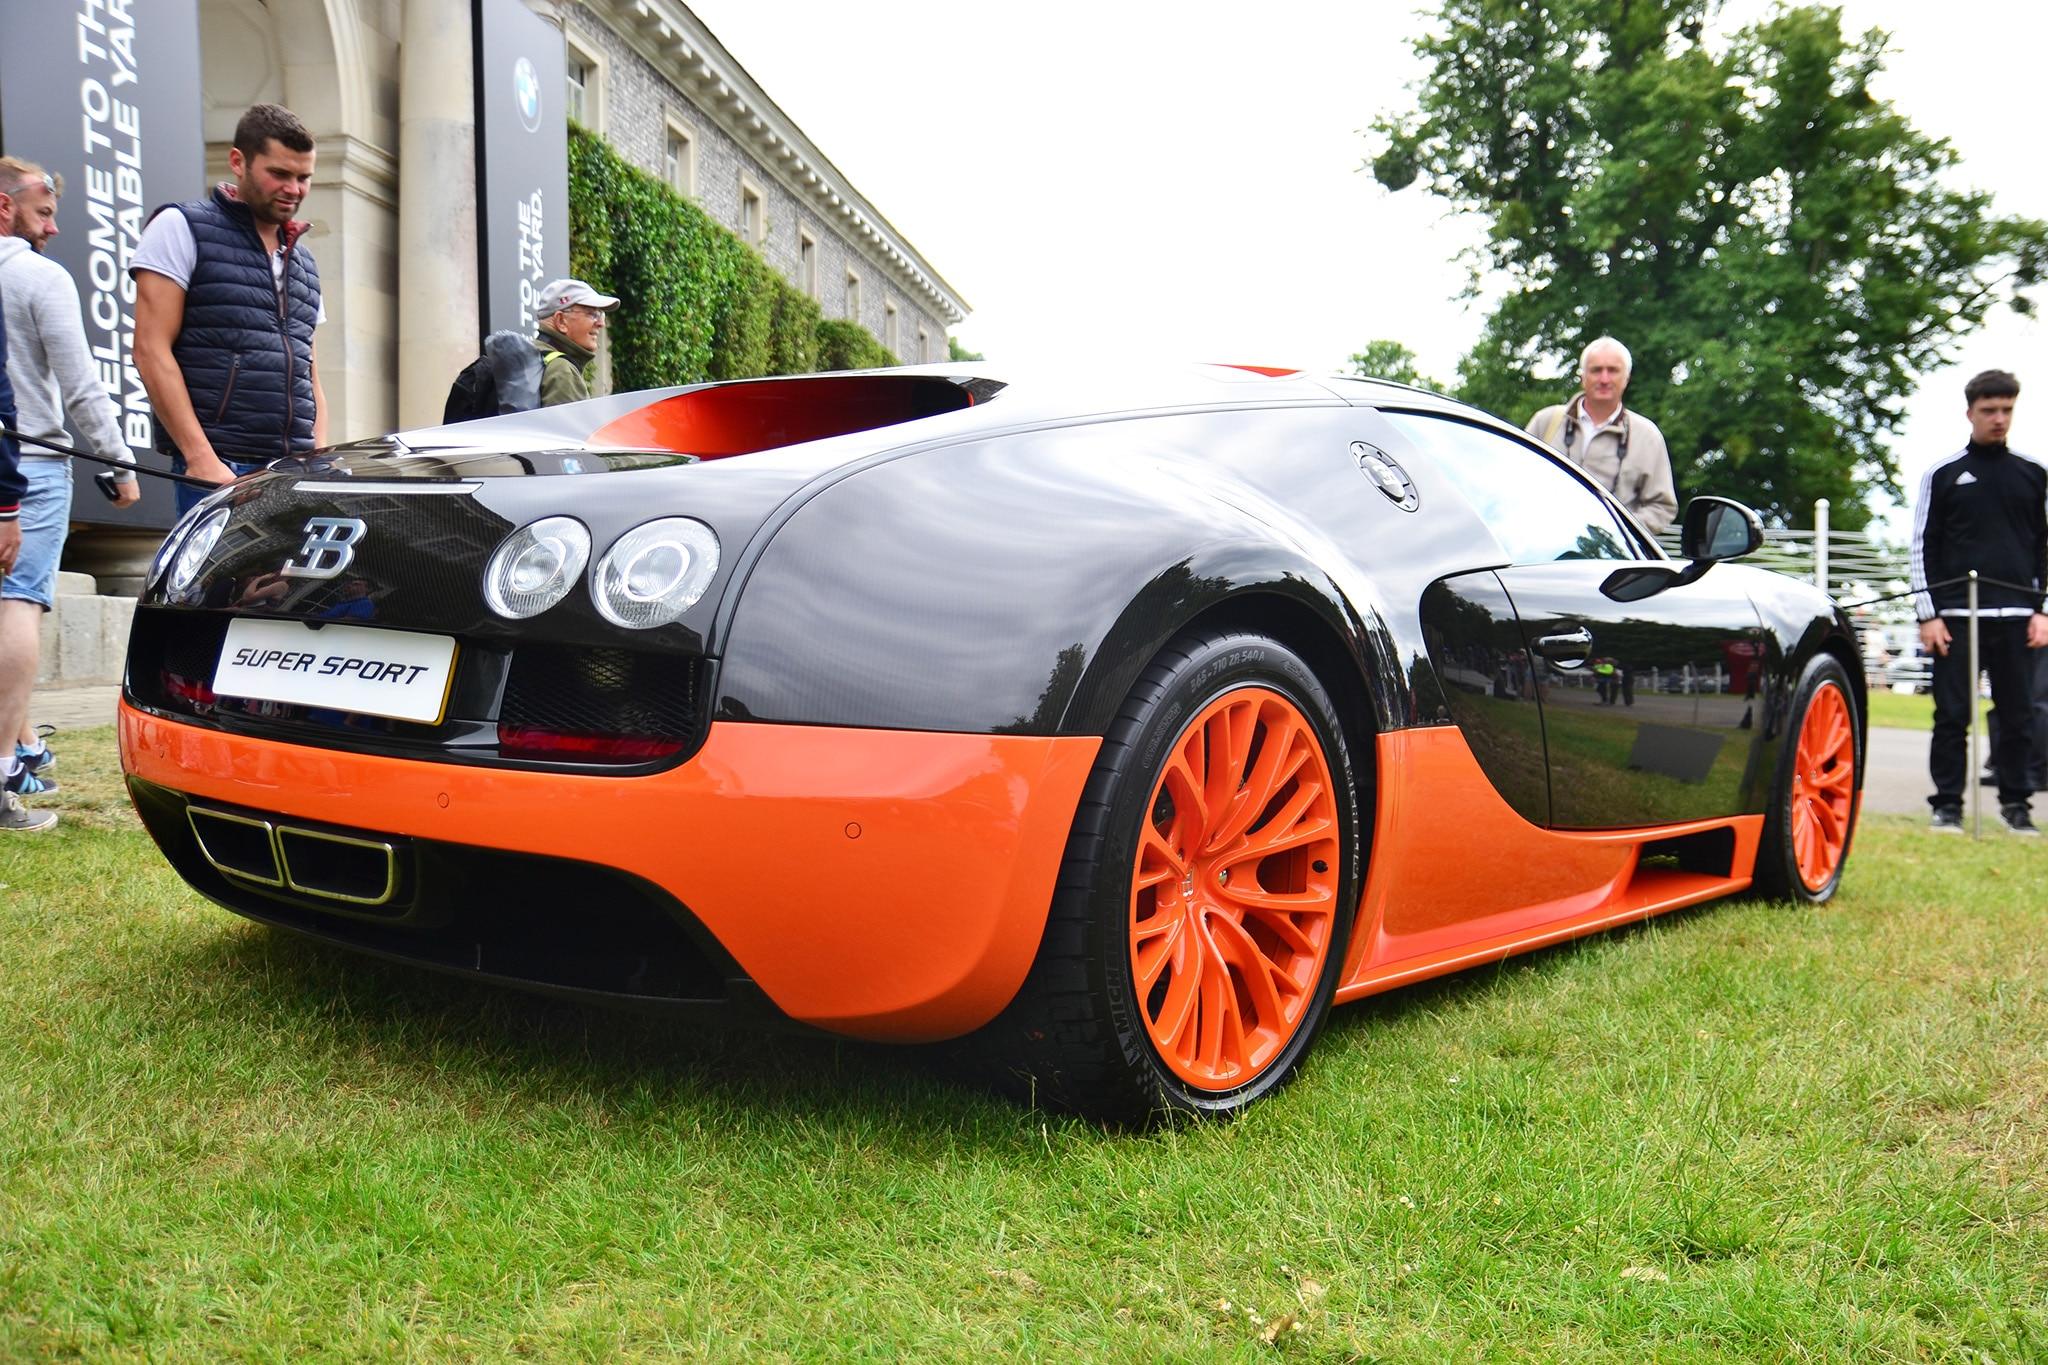 bugatti displayed 9 404 horsepower at the 2017 goodwood. Black Bedroom Furniture Sets. Home Design Ideas